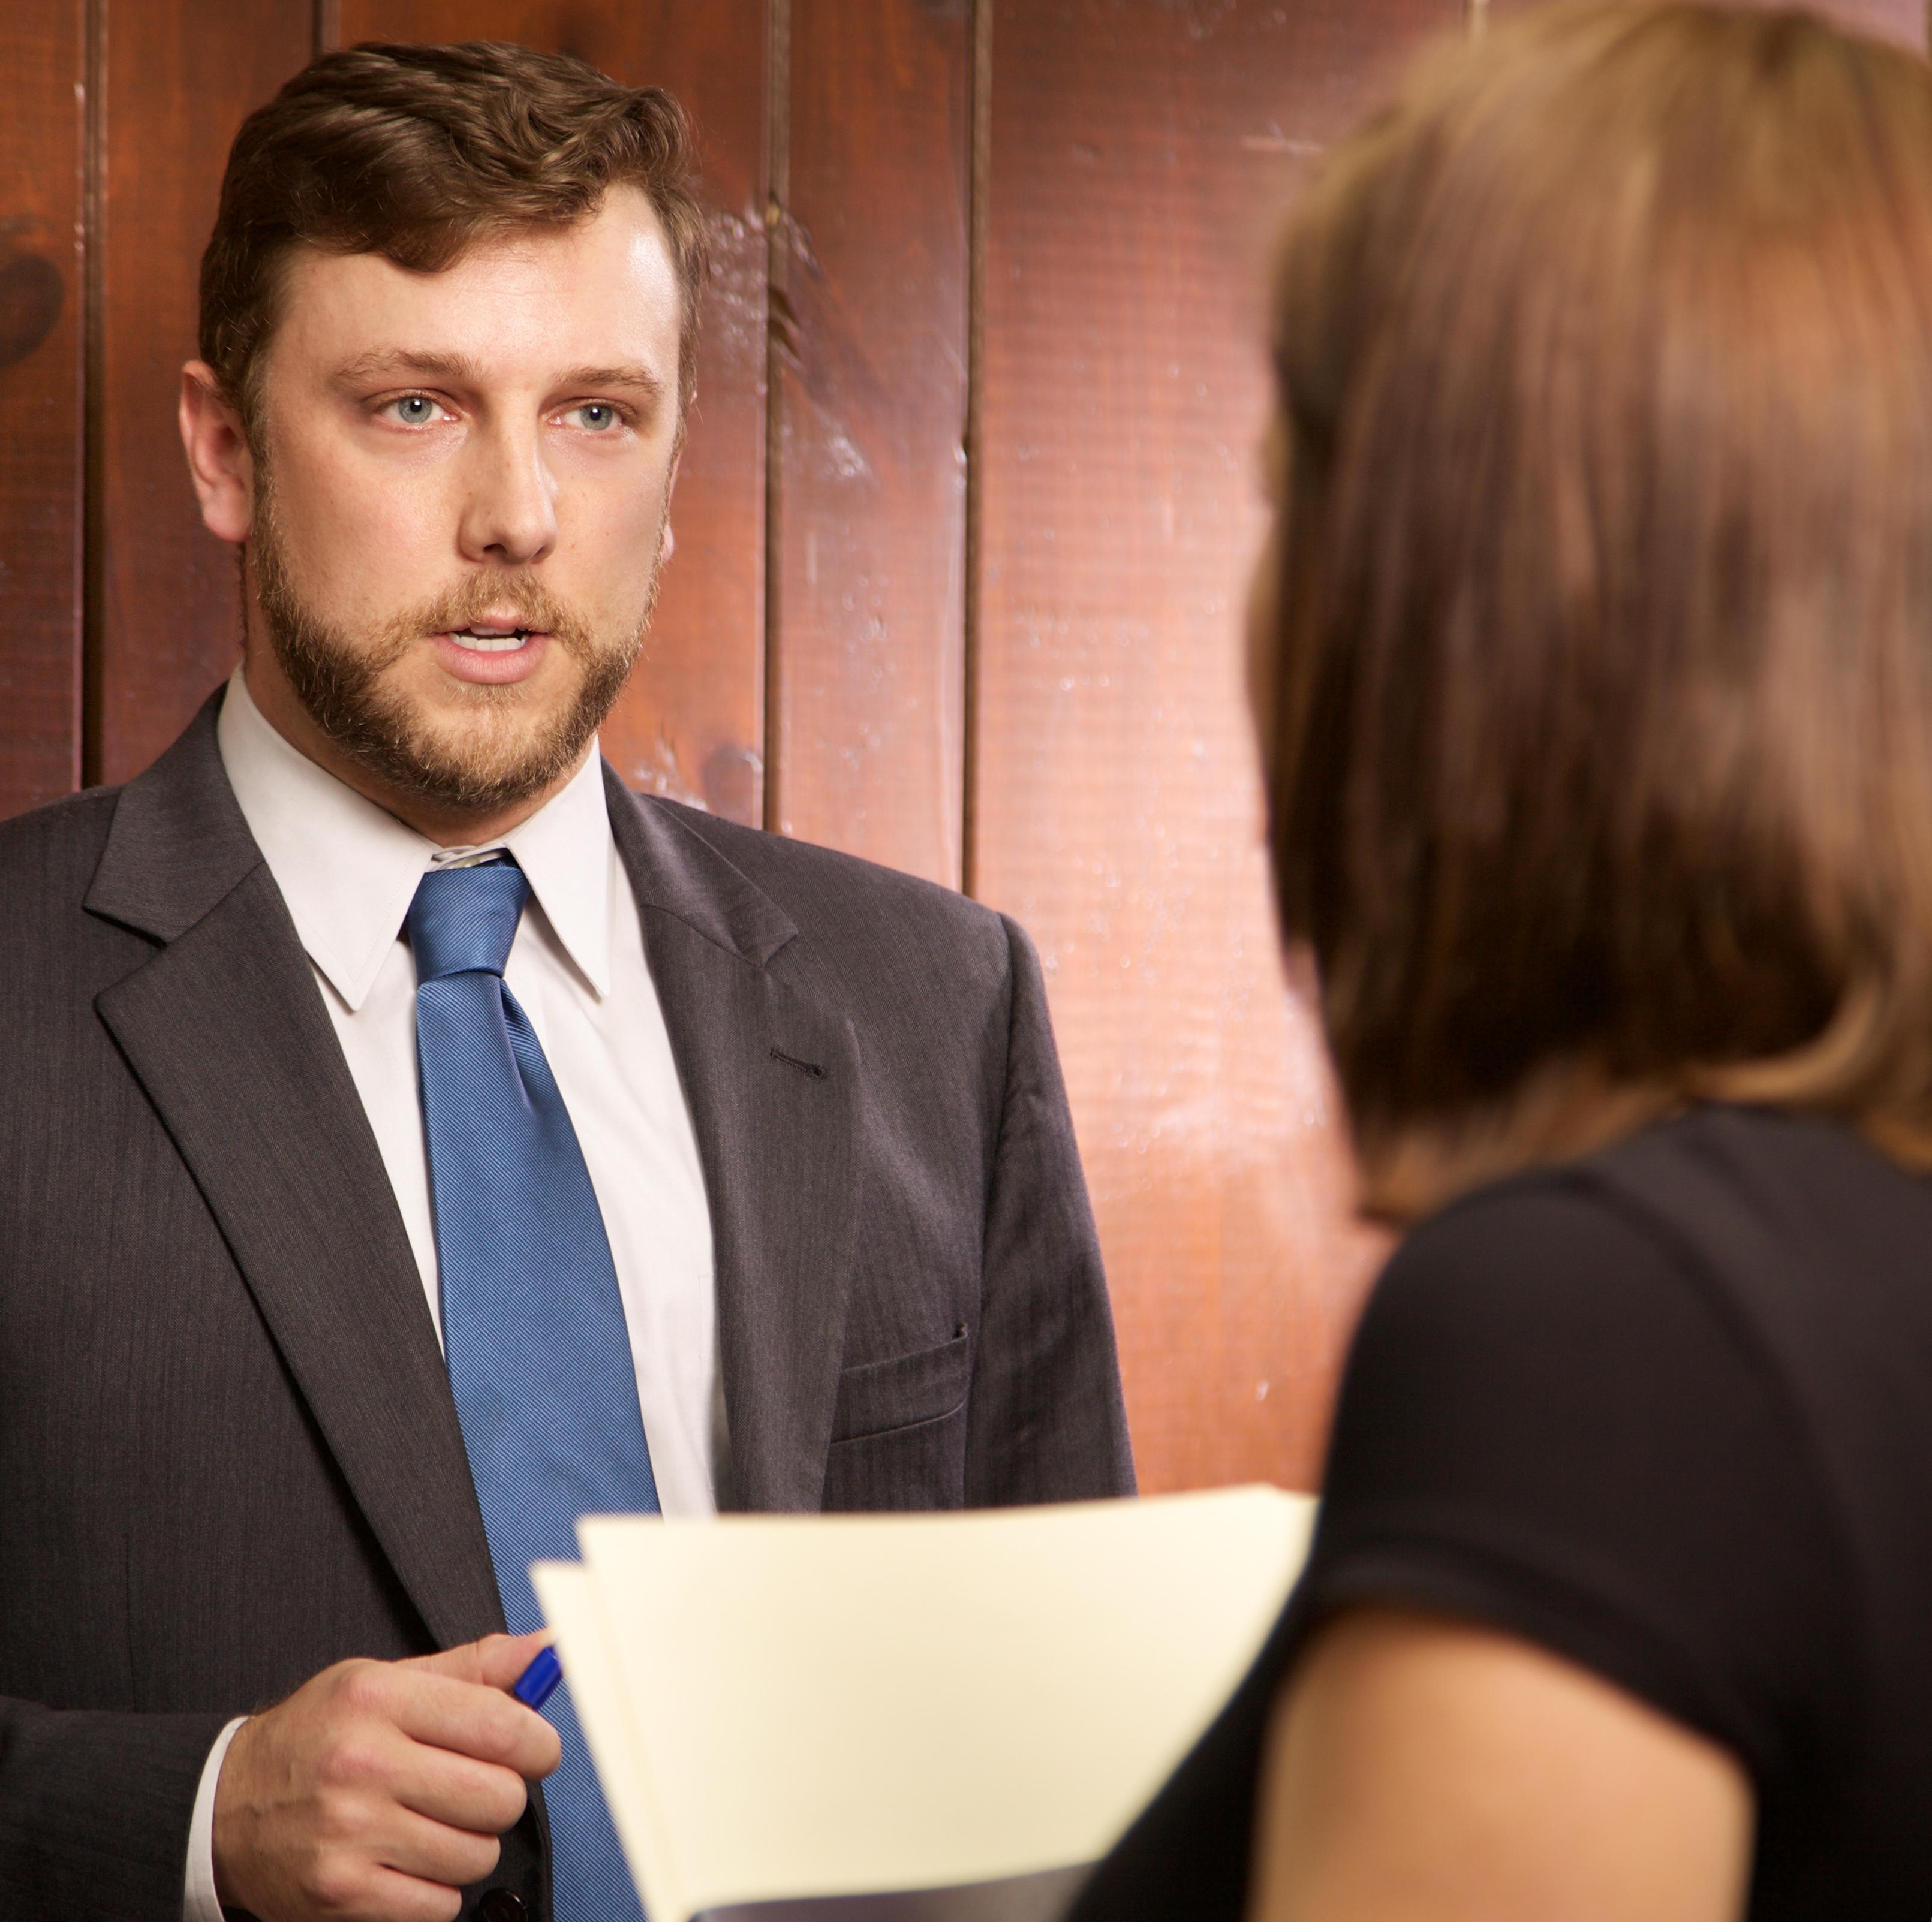 McLeod Fraser & Cone | Walterboro Lawyer image 4